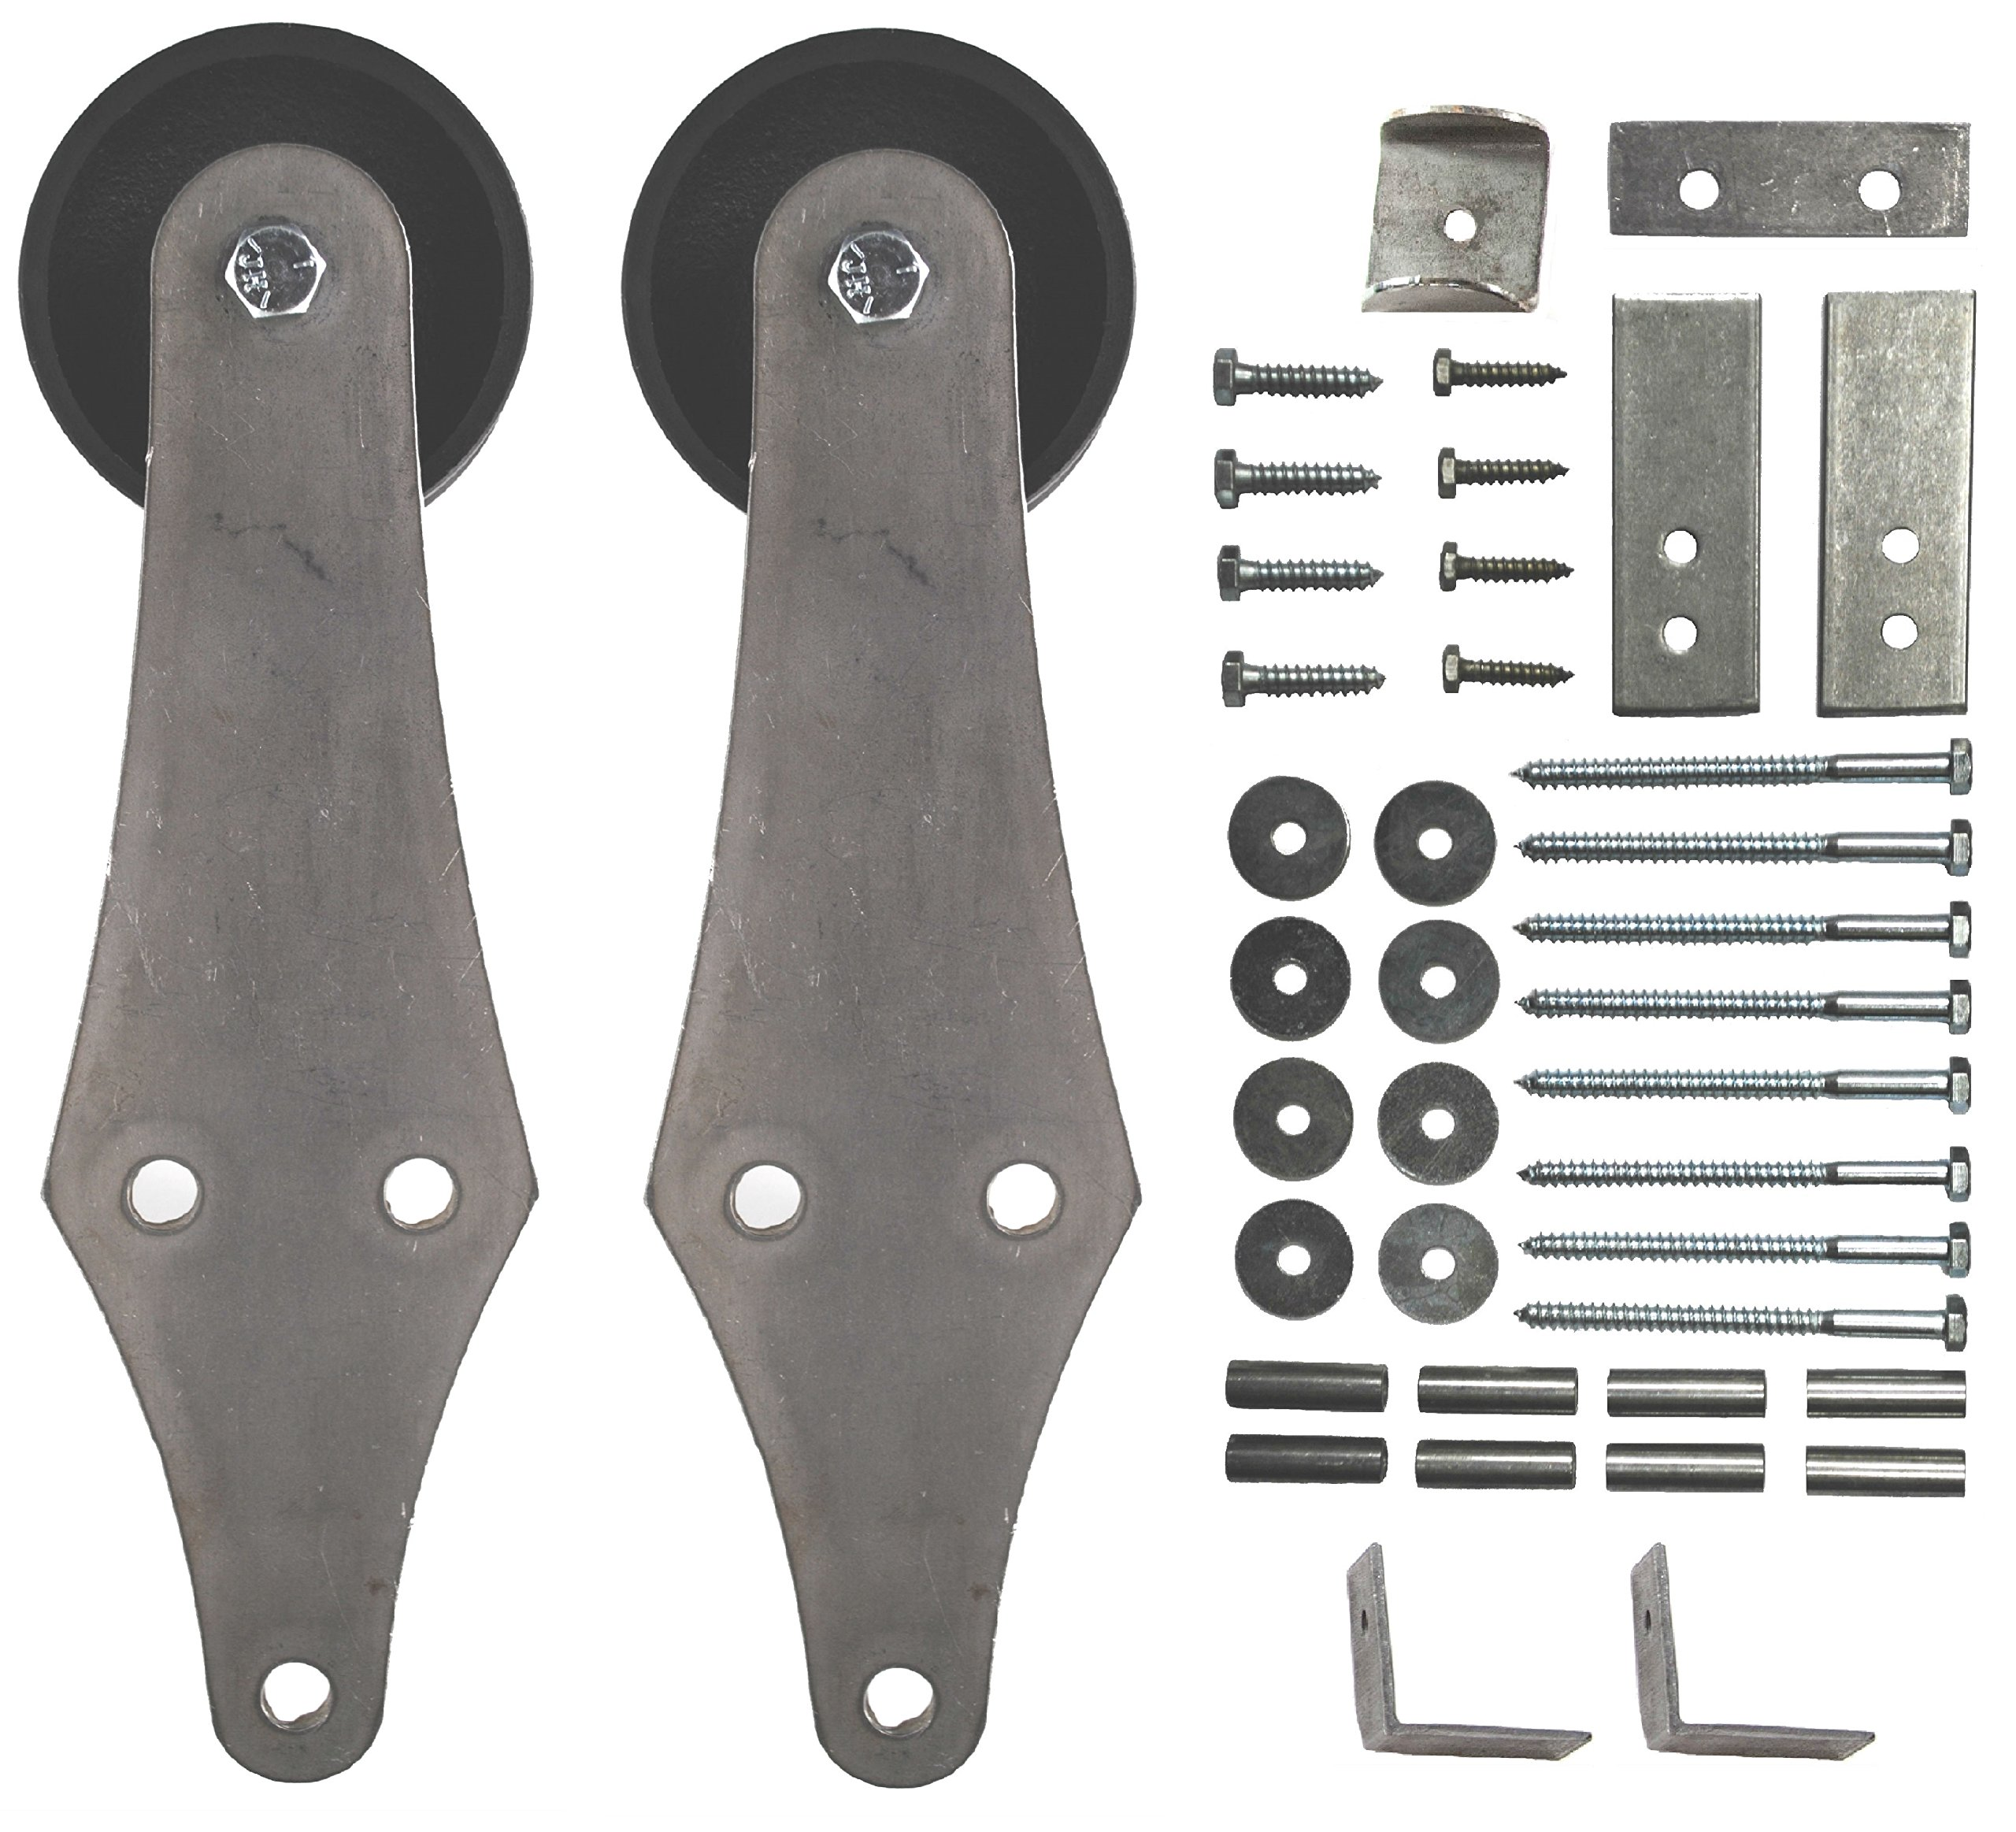 Sliding Barn Door Hanger Kit Hinge Style with Hardware - 2 pcs. (No Track)